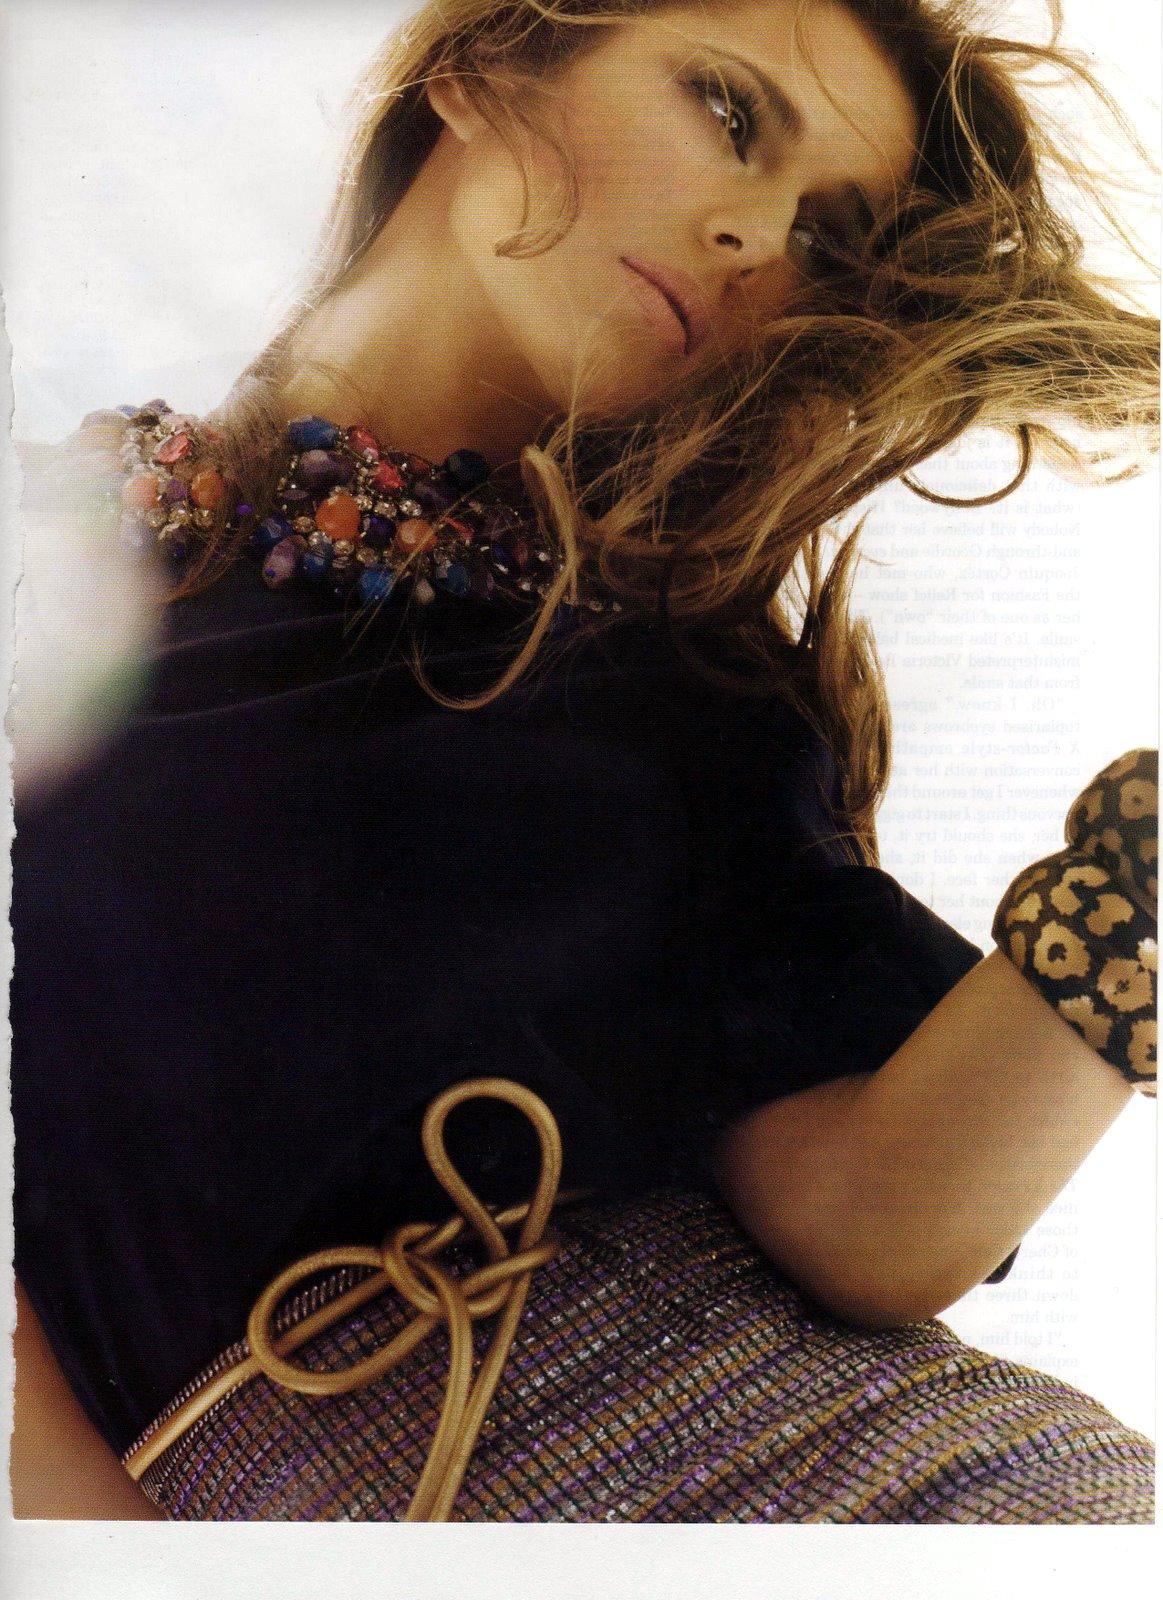 http://1.bp.blogspot.com/_1fFlqwR2_8E/S8xAgMlO7nI/AAAAAAAACXs/MX2b4Cw01T4/s1600/22968_Cheryl_Cole_Vogue-2_122_563lo.jpg